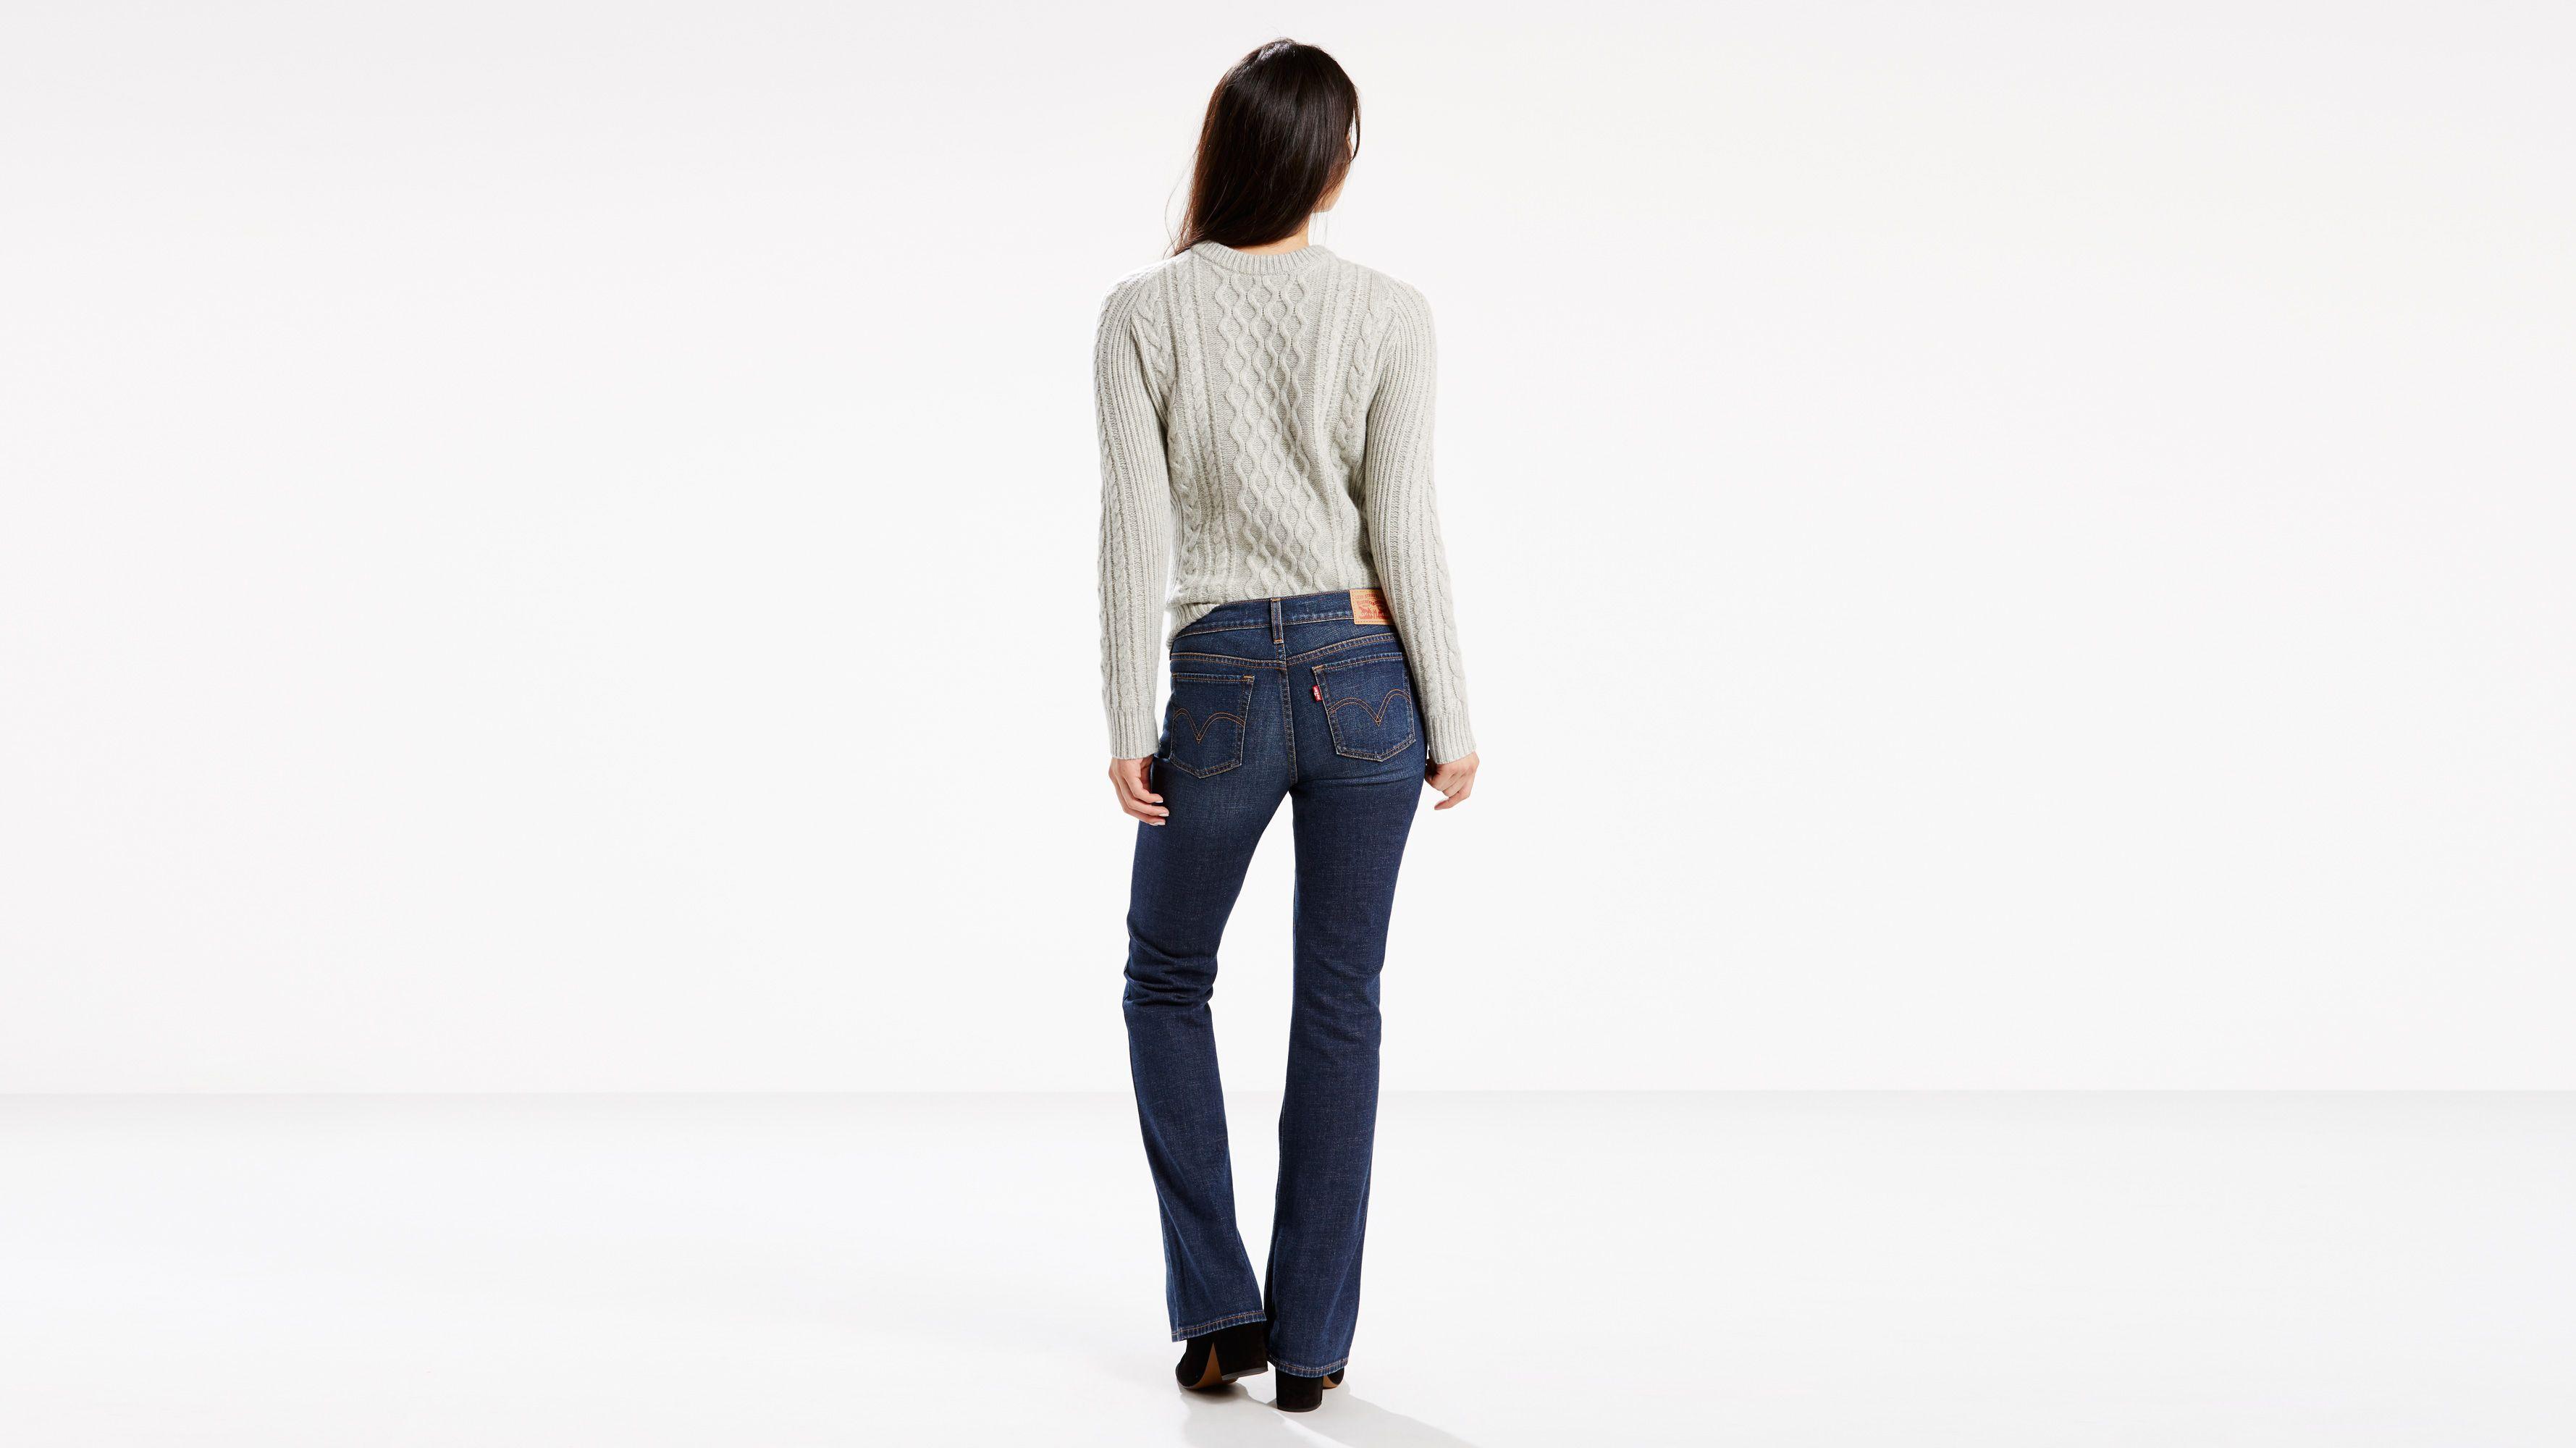 098dc66f3a7 415 Classic Boot Cut Jeans - Medium Wash | Levi's® US